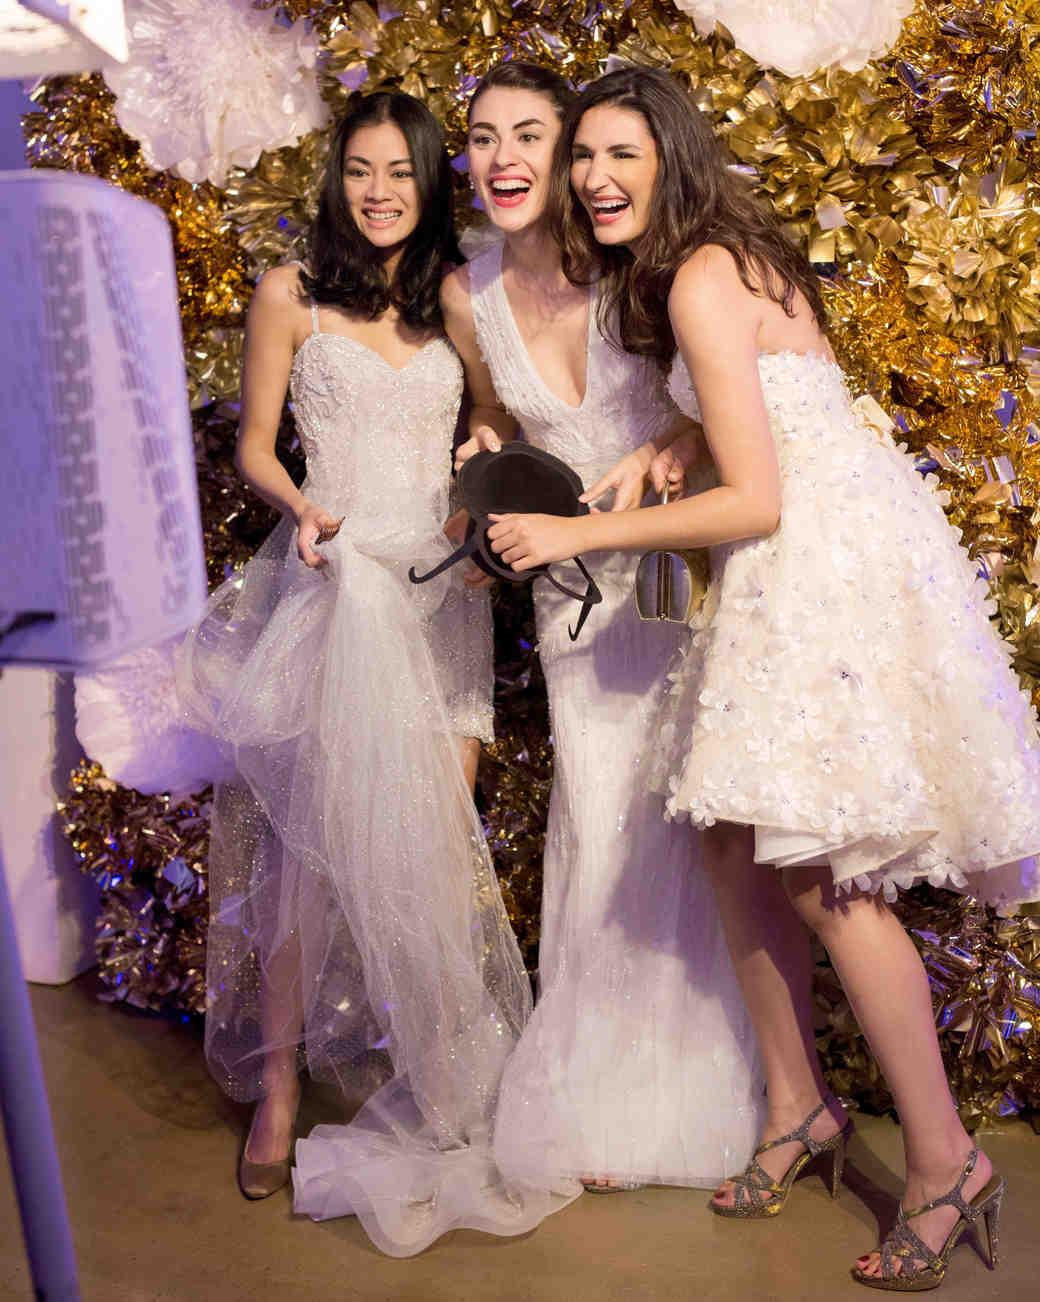 martha-weddings-party-2015-smilebooth-0301-1015.jpg